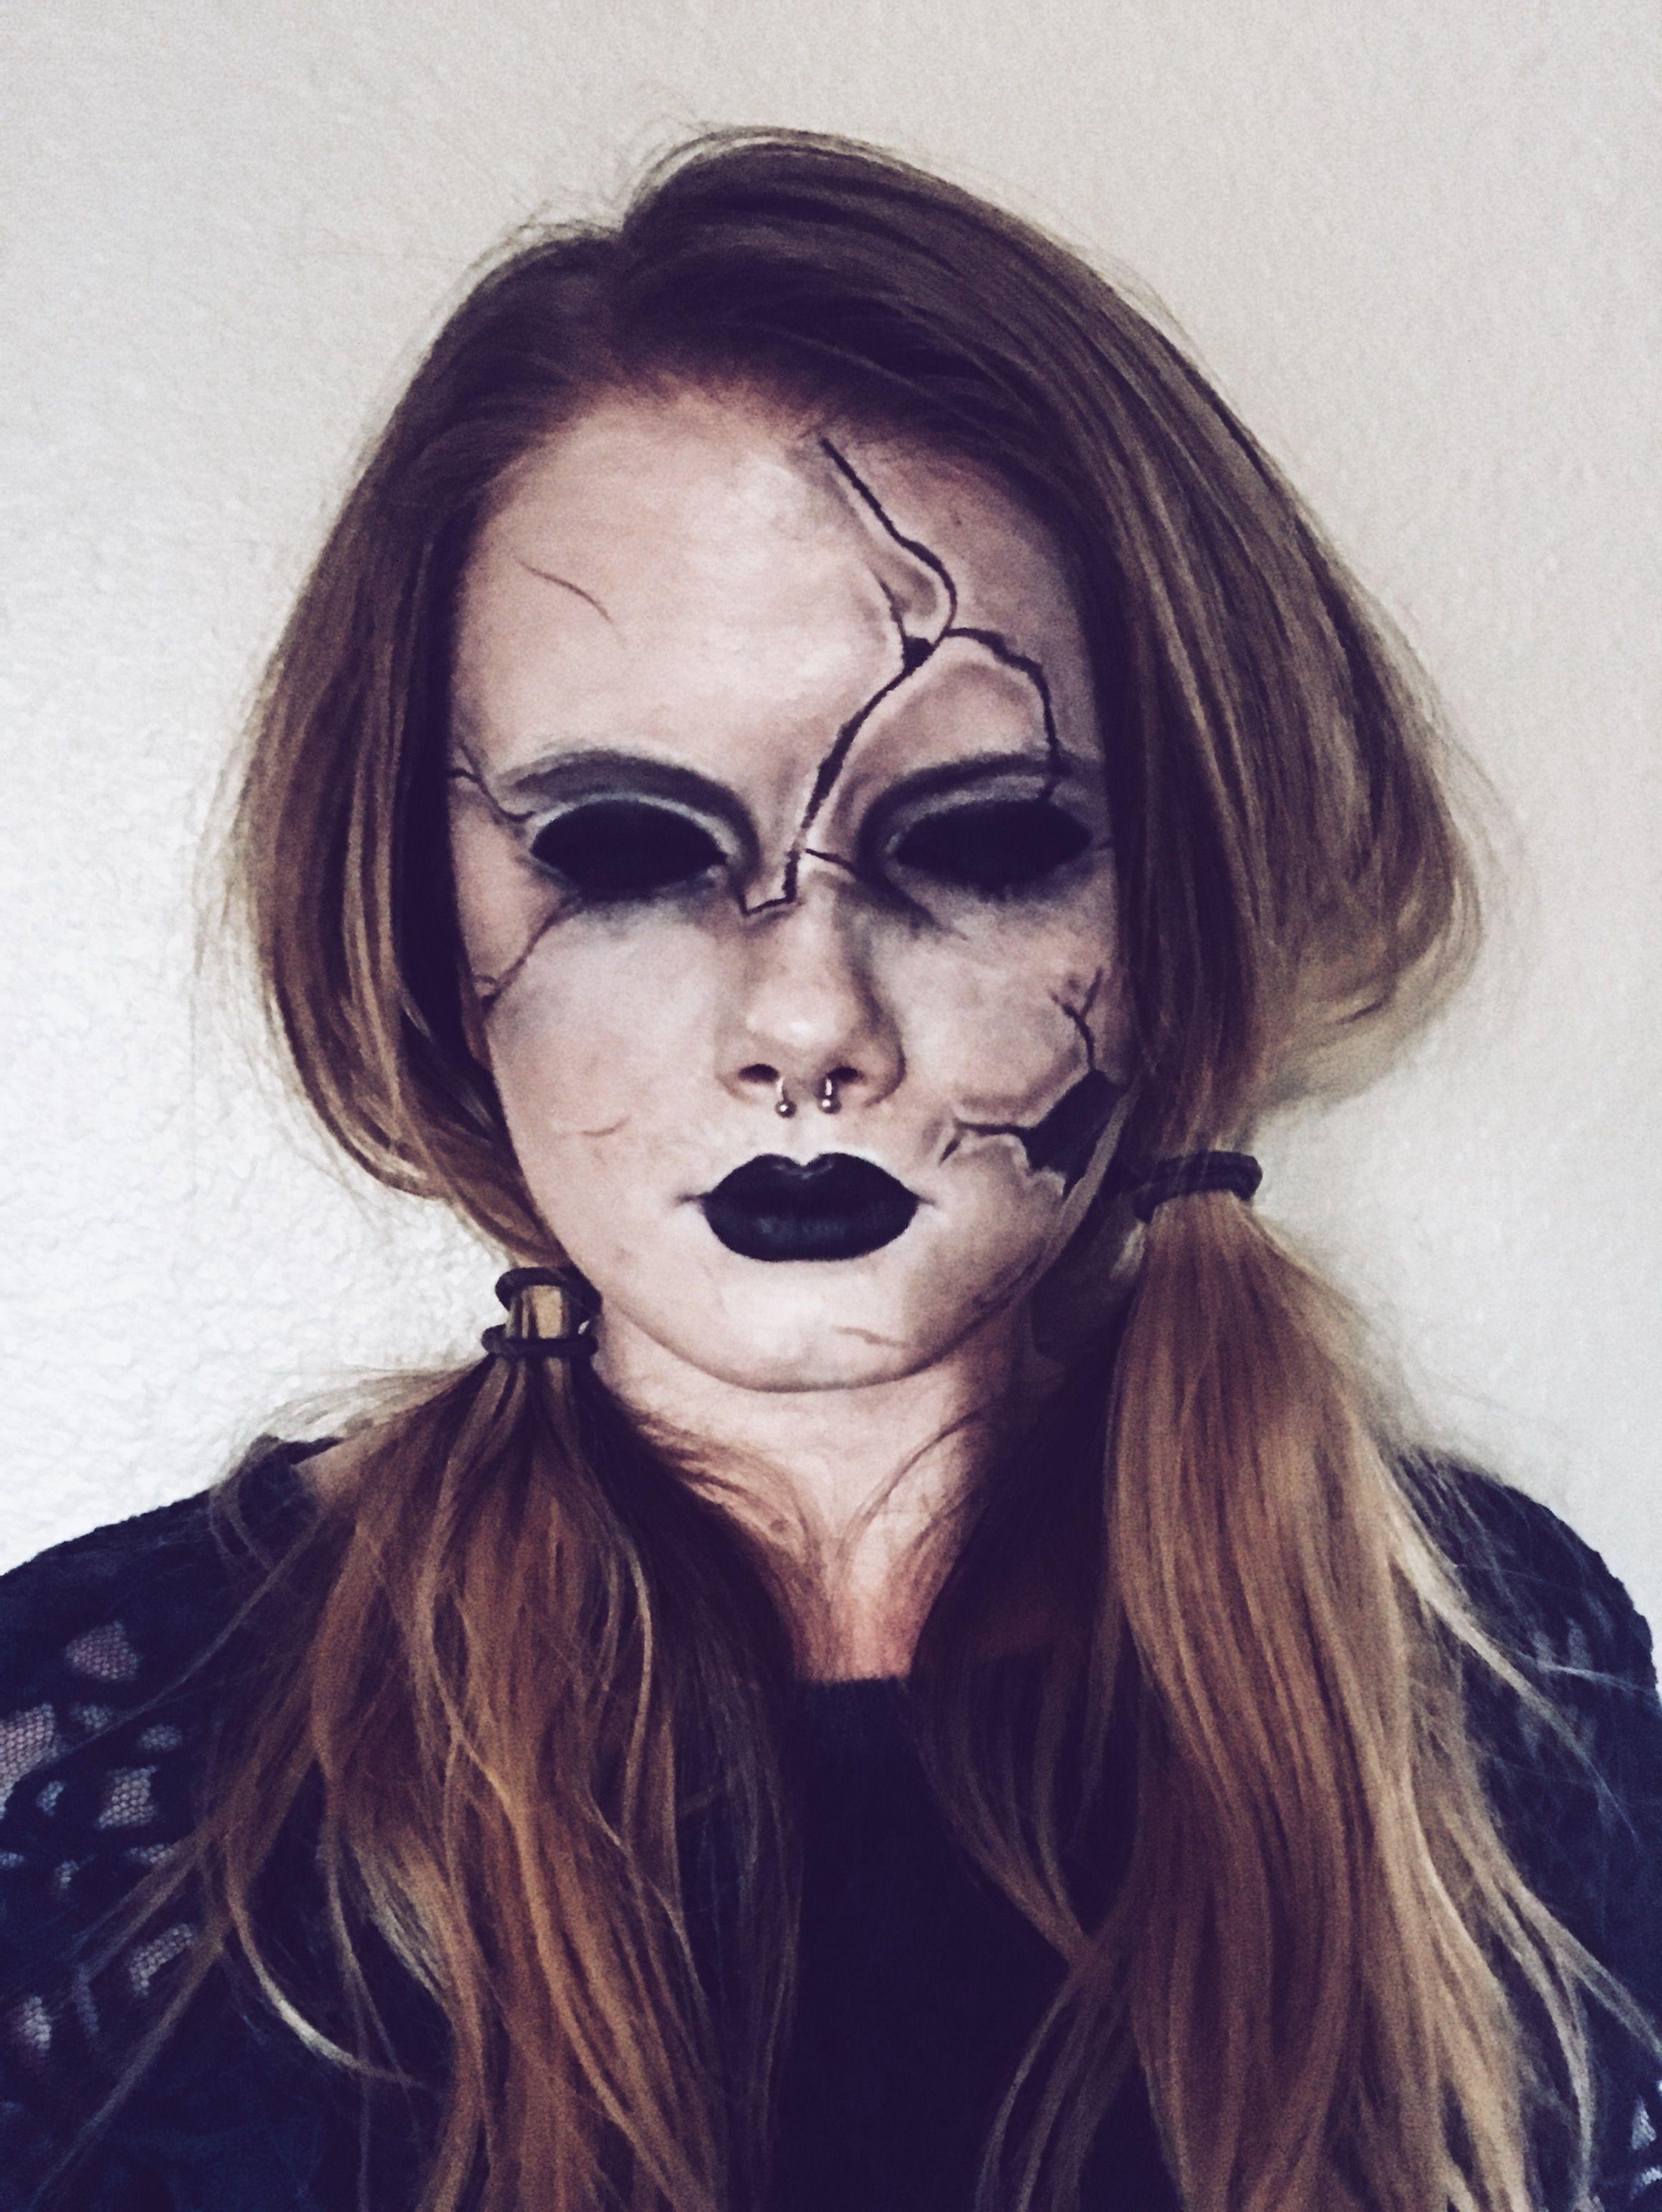 Makeup Halloween Doll 29 Ideas With Images Halloween Makeup